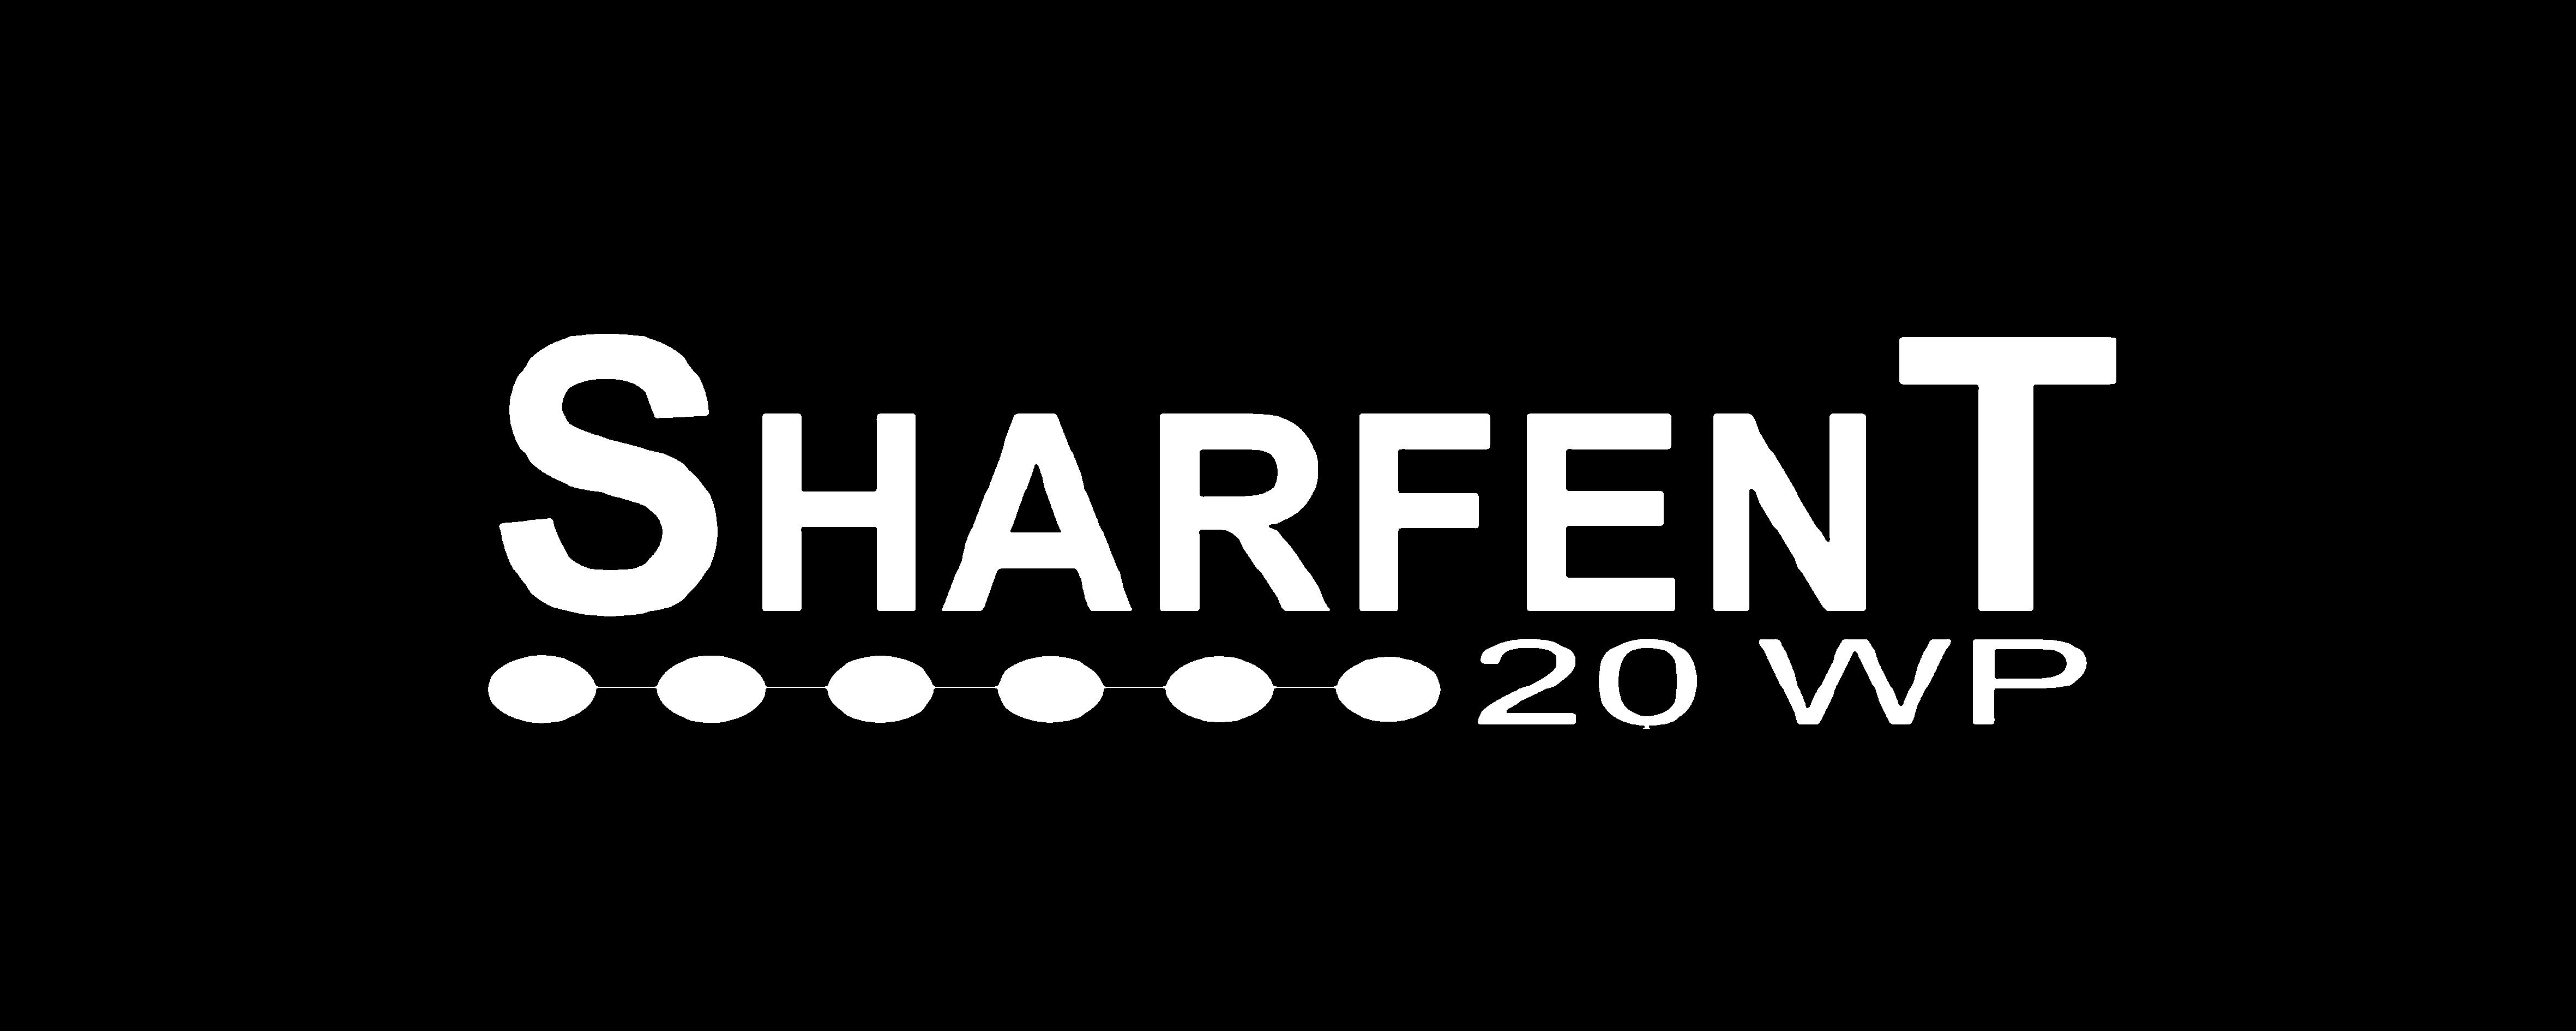 SHARFENT-20-WP